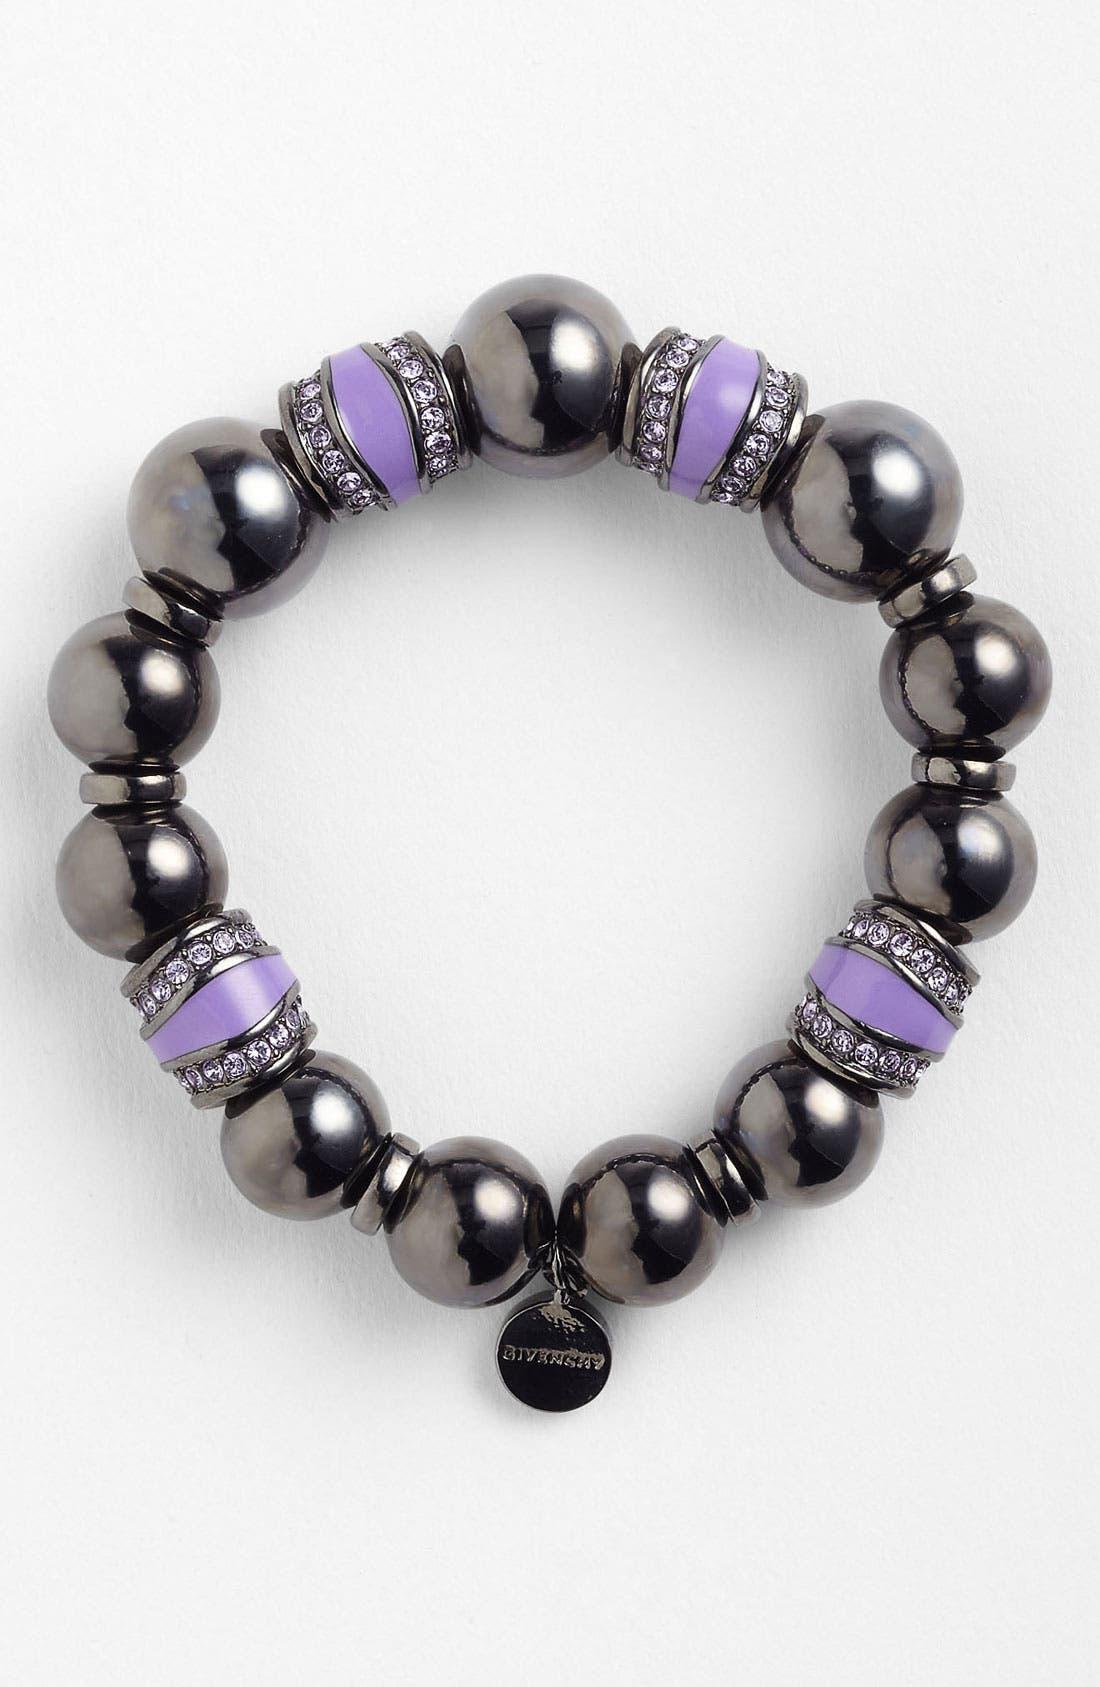 Main Image - Givenchy 'Harvest' Bead Stretch Bracelet